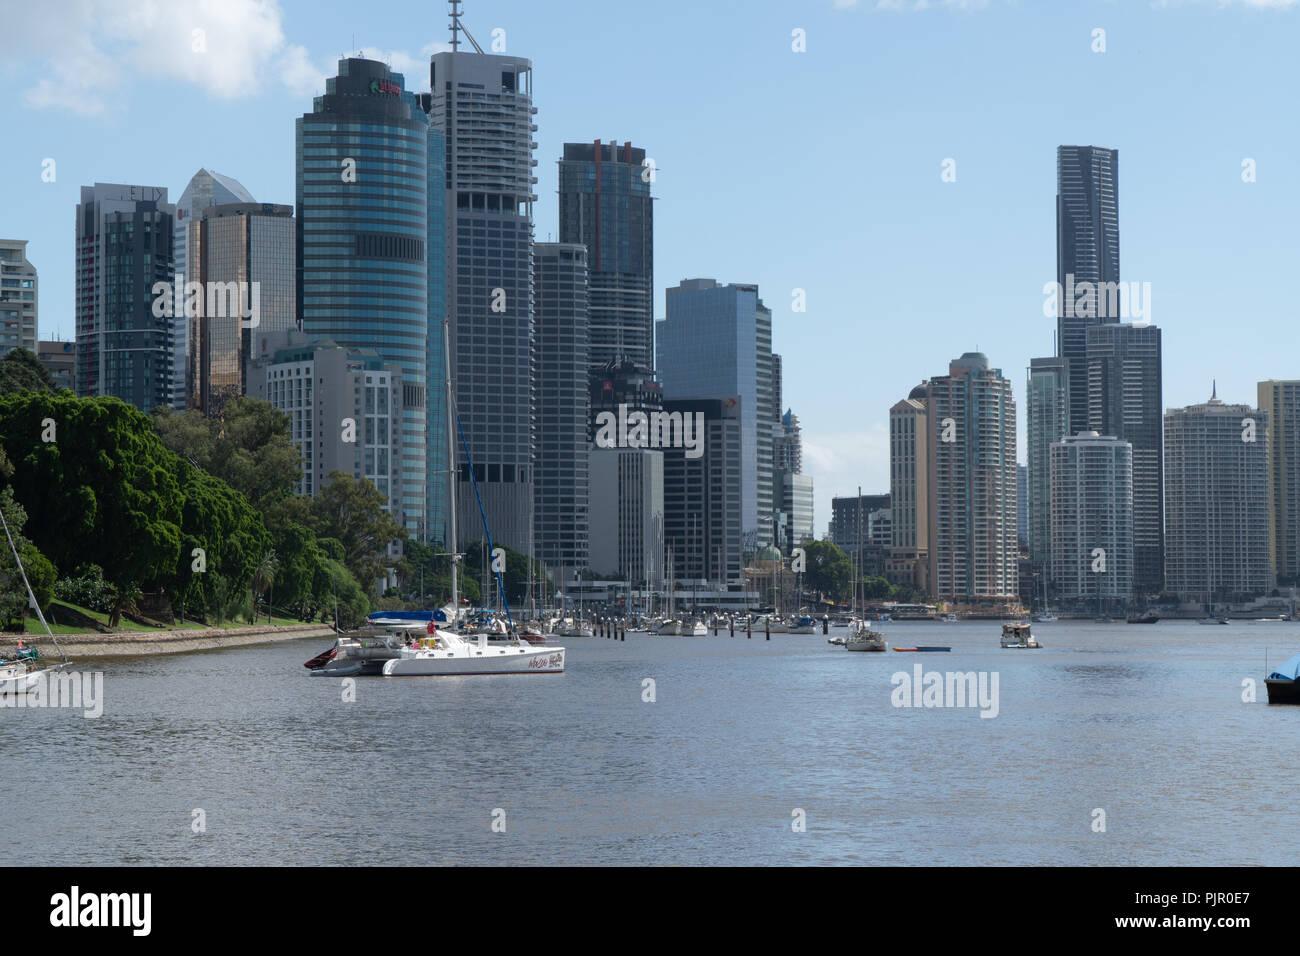 Panorama of modern skyscrapers in downtown Brisbane, Australia - Stock Image